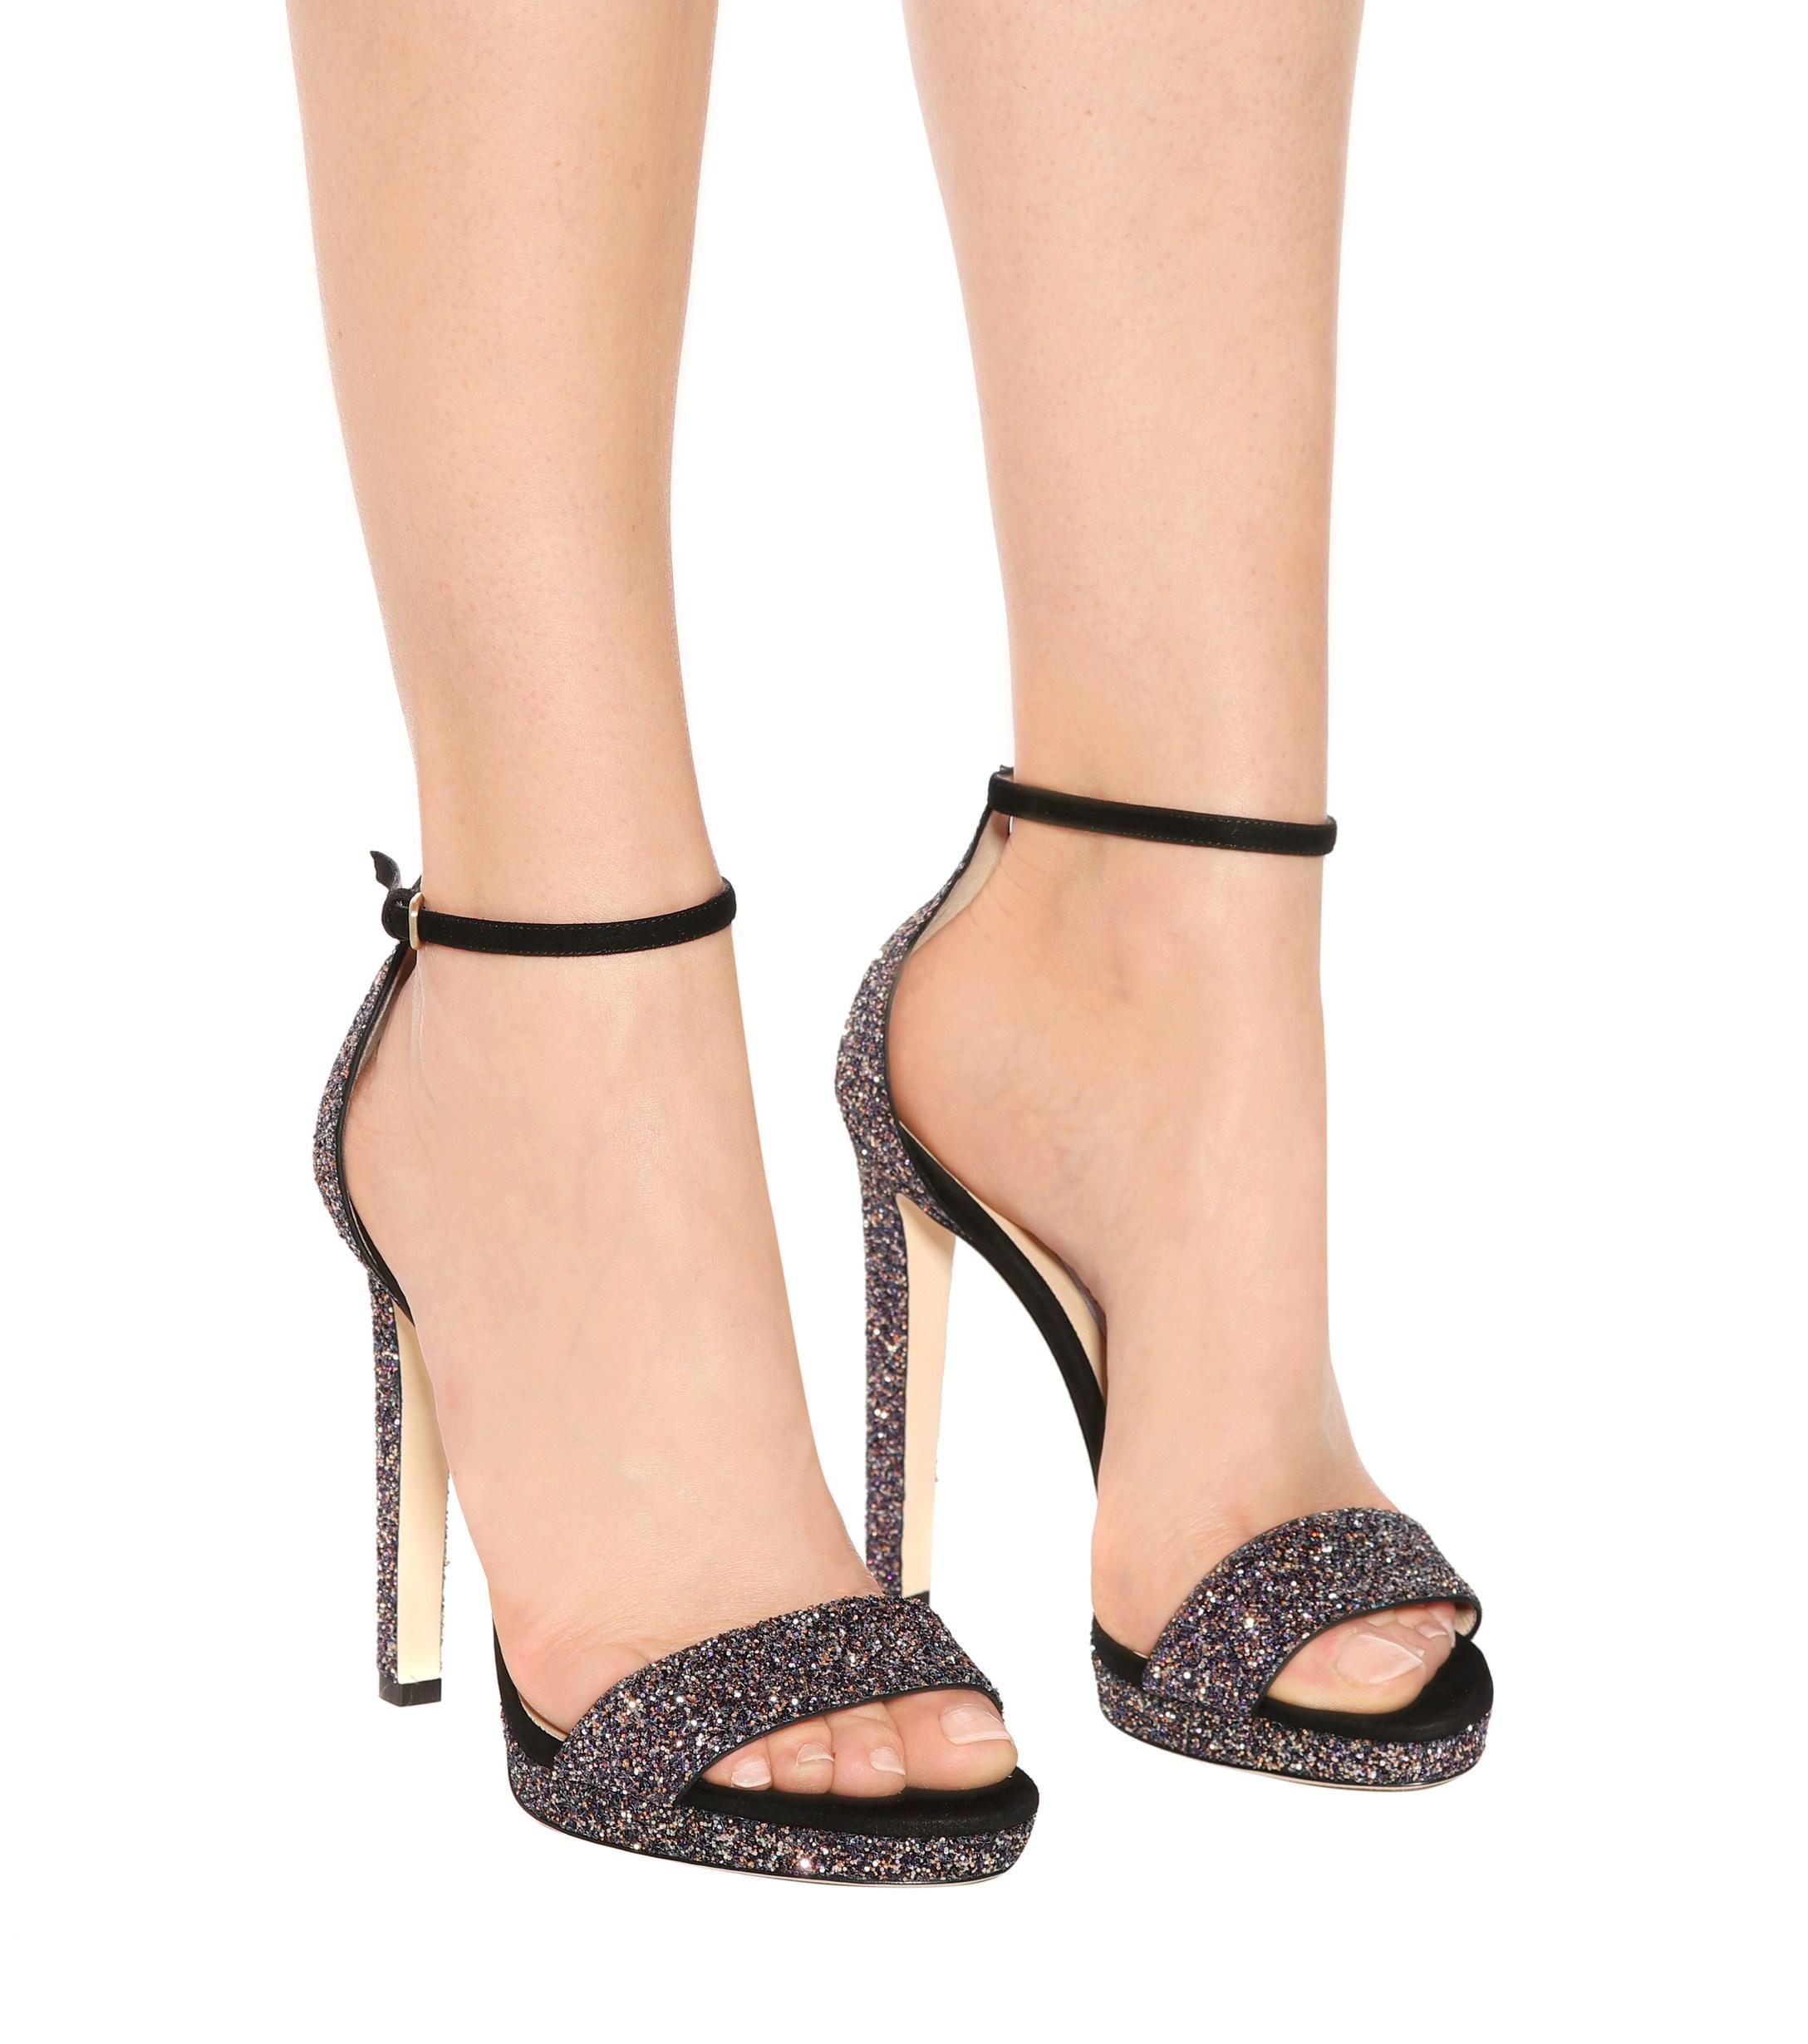 c85ce26dd56 Jimmy Choo - Black Misty 120 Glitter Sandals - Lyst. View fullscreen